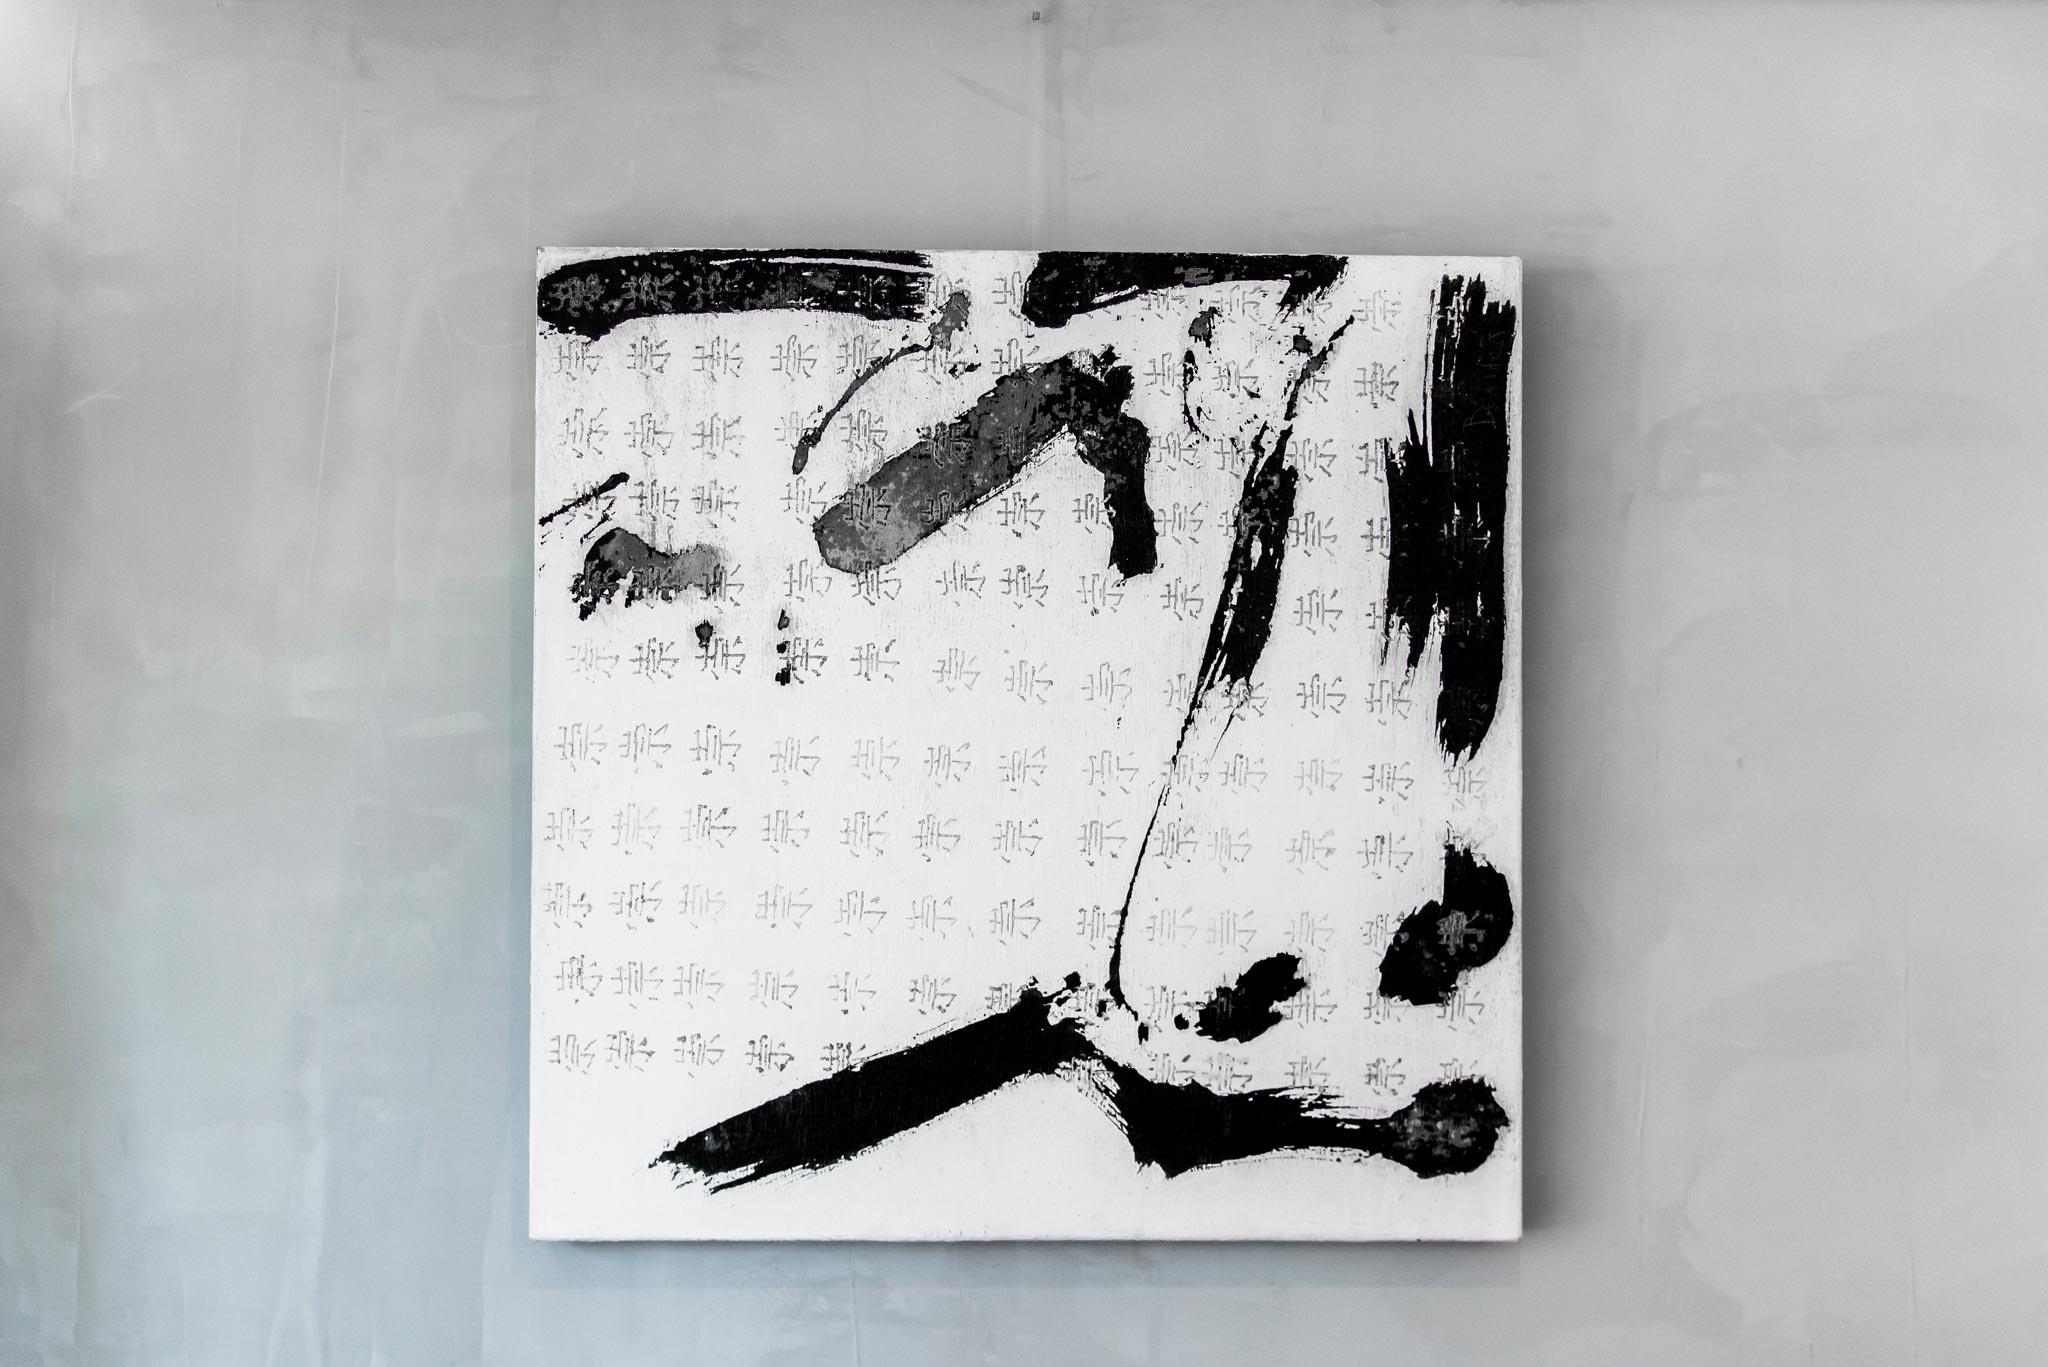 ES BainSaillon 6060 art hor 17 01 027 - ...Suite des bains de saillon